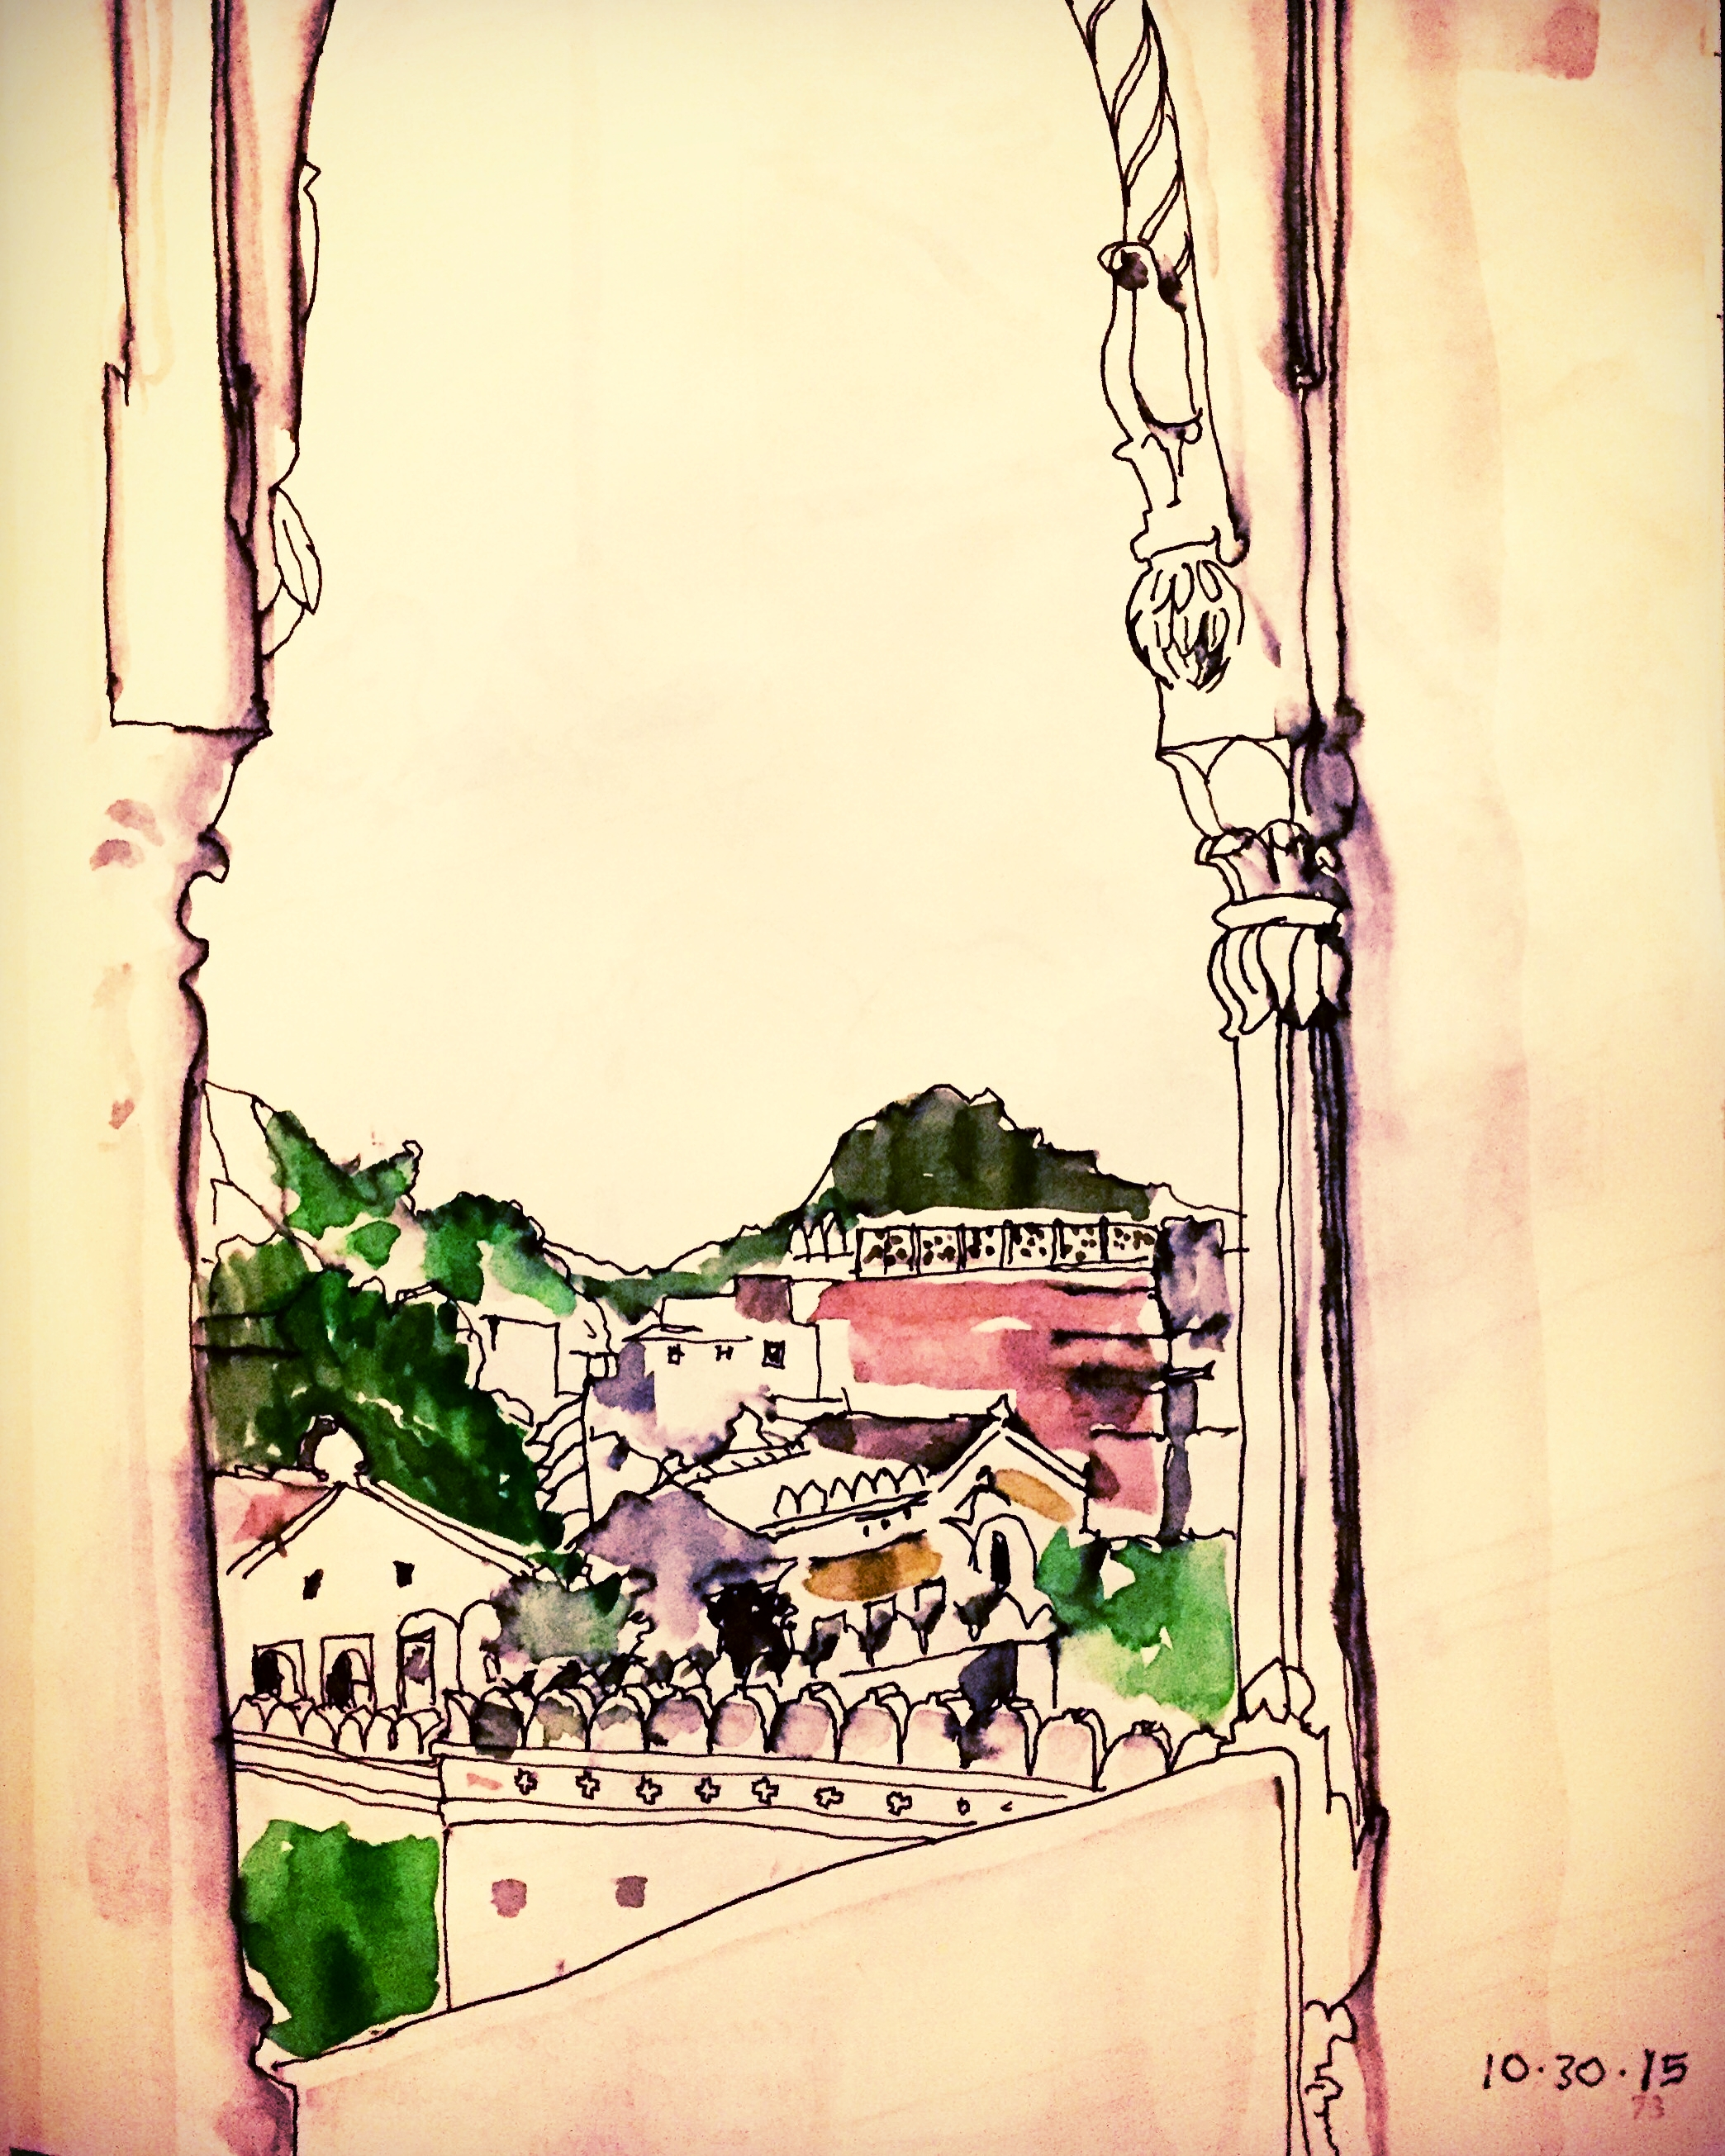 narlai-balcony_22653997331_o.jpg